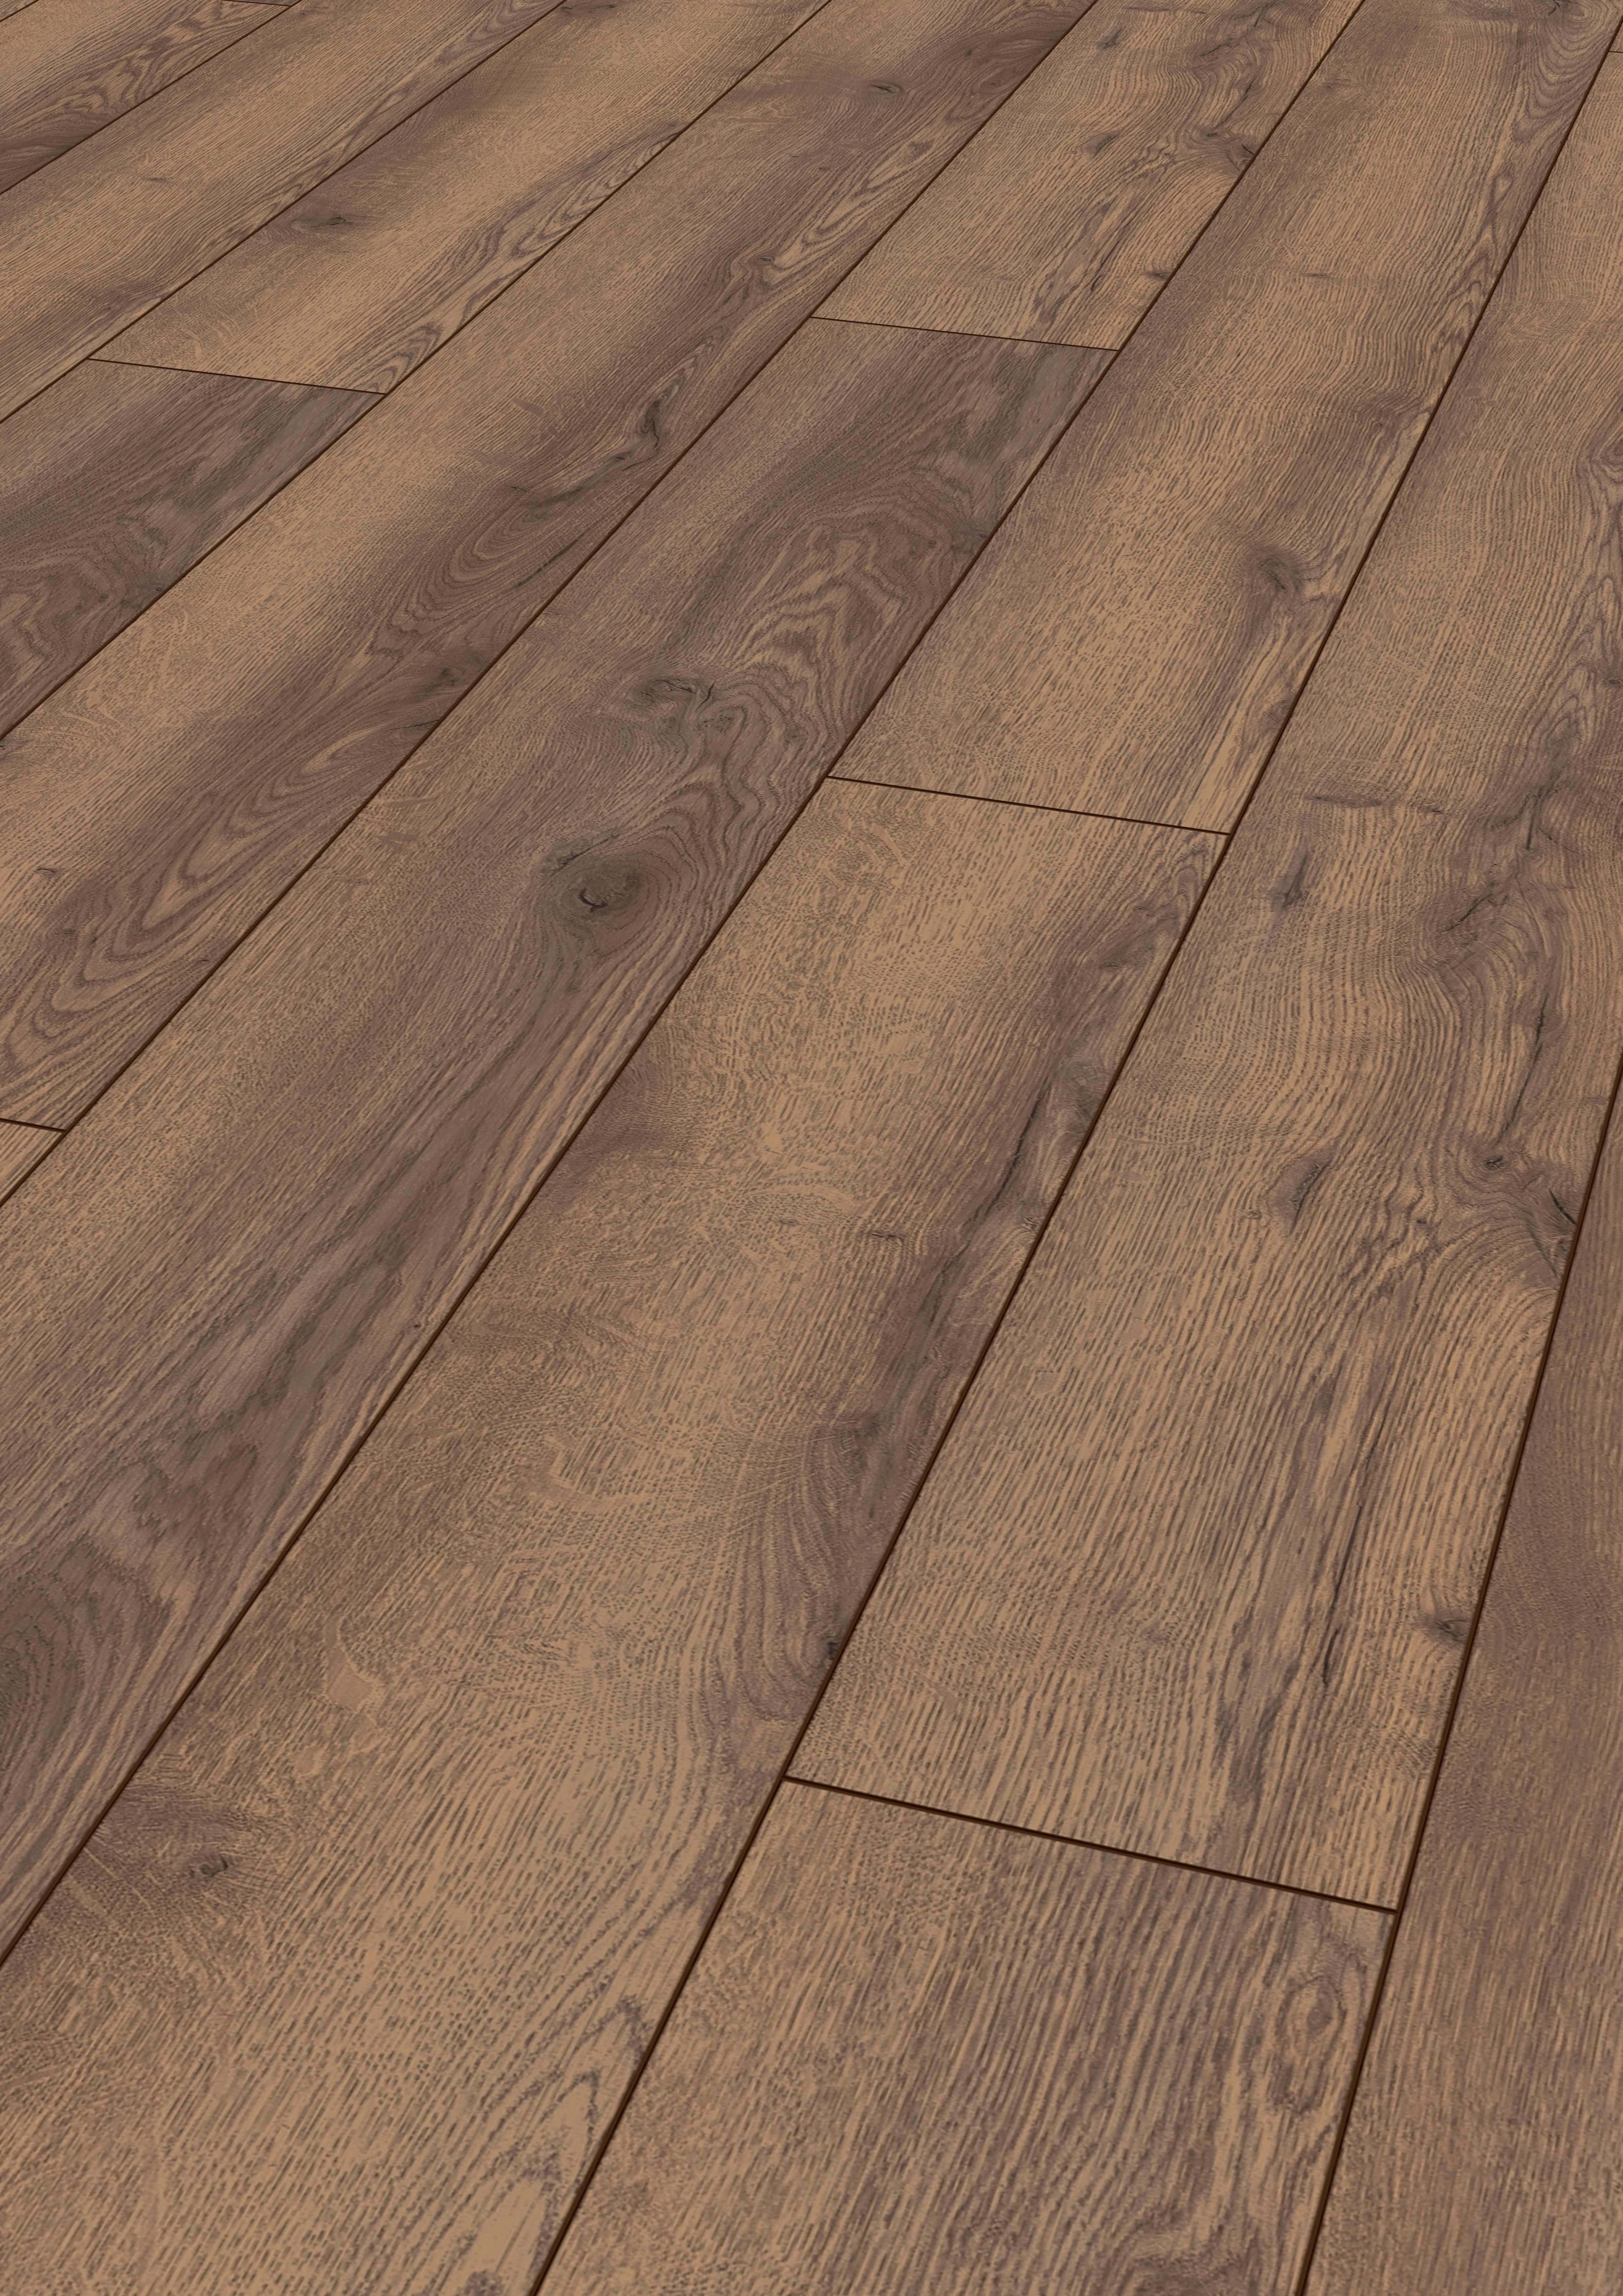 hardwood flooring toronto installation price of mammut laminate flooring in country house plank style kronotex regarding download picture amp